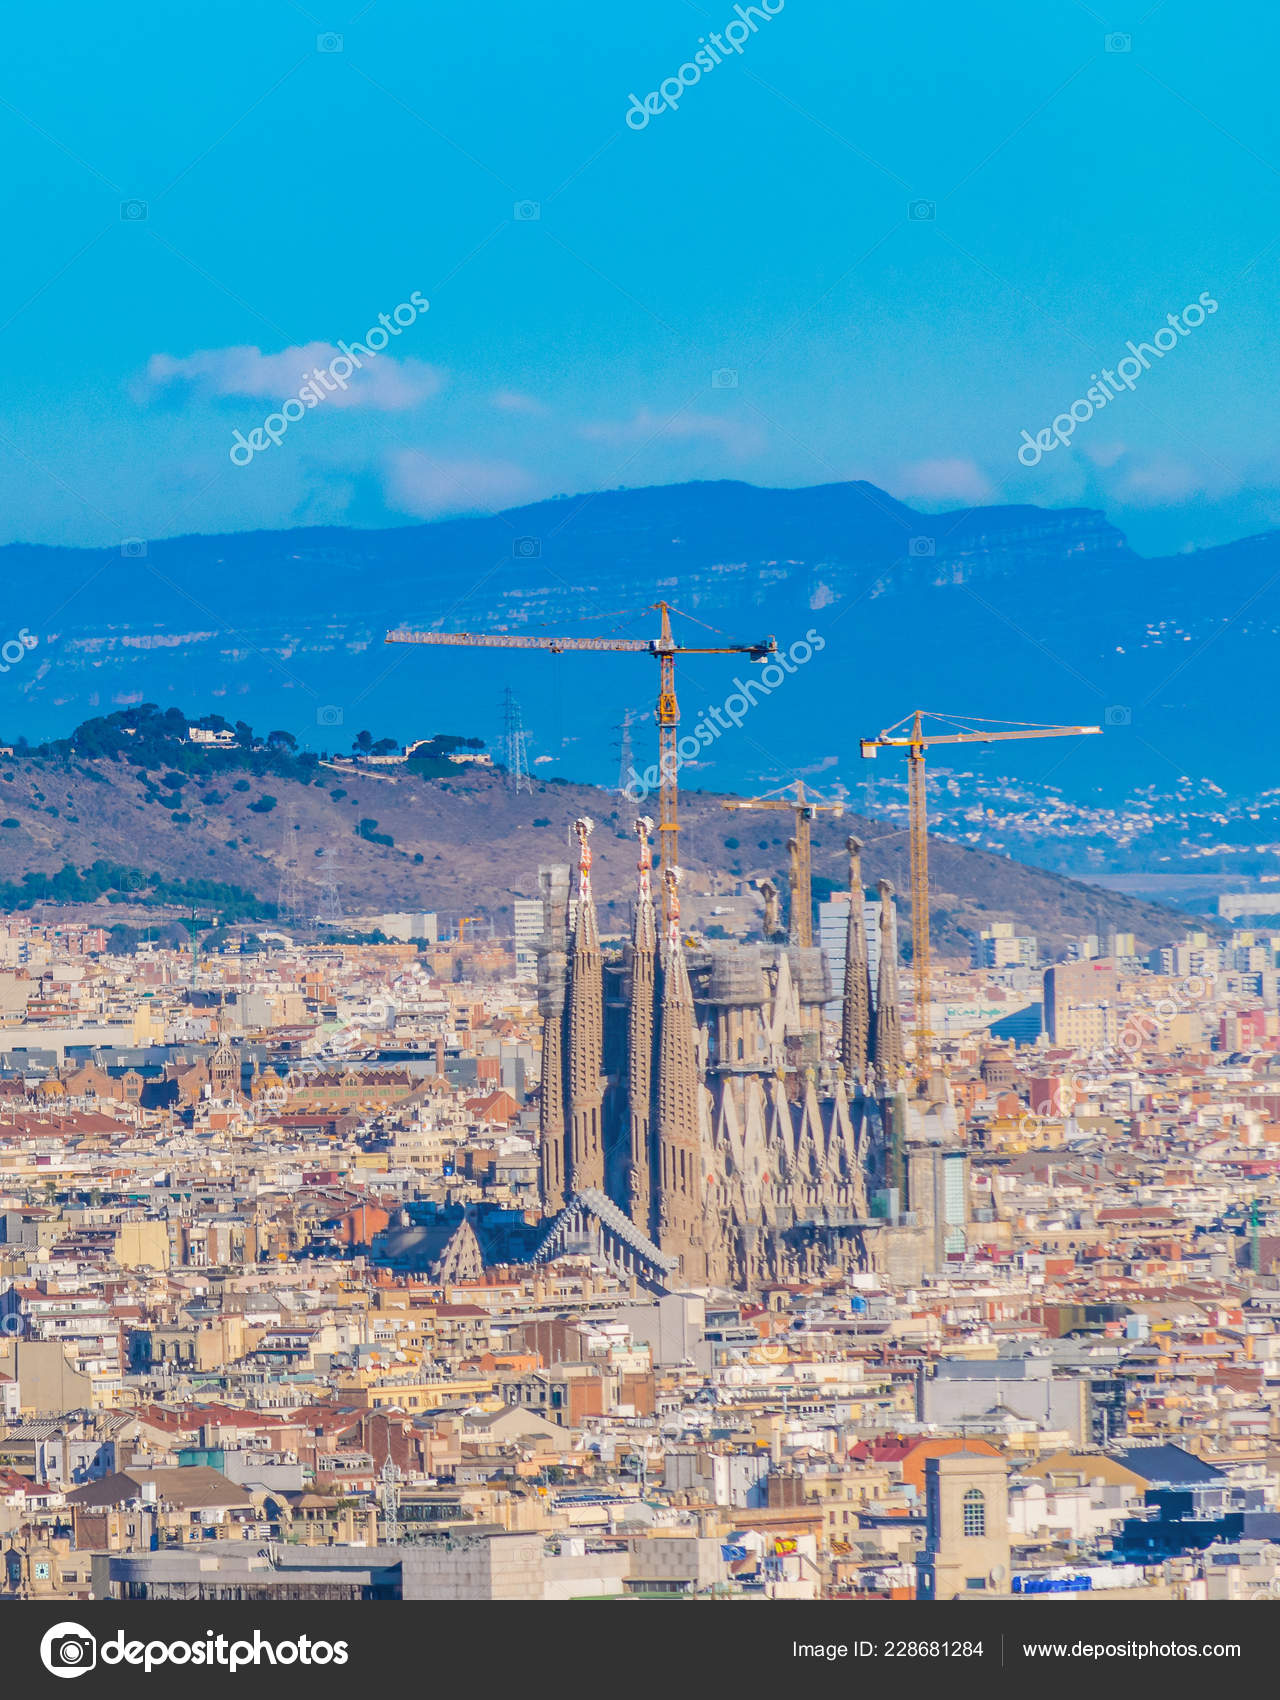 Barcelona Spain January 2018 Aerial View Barcelona City Montjuic